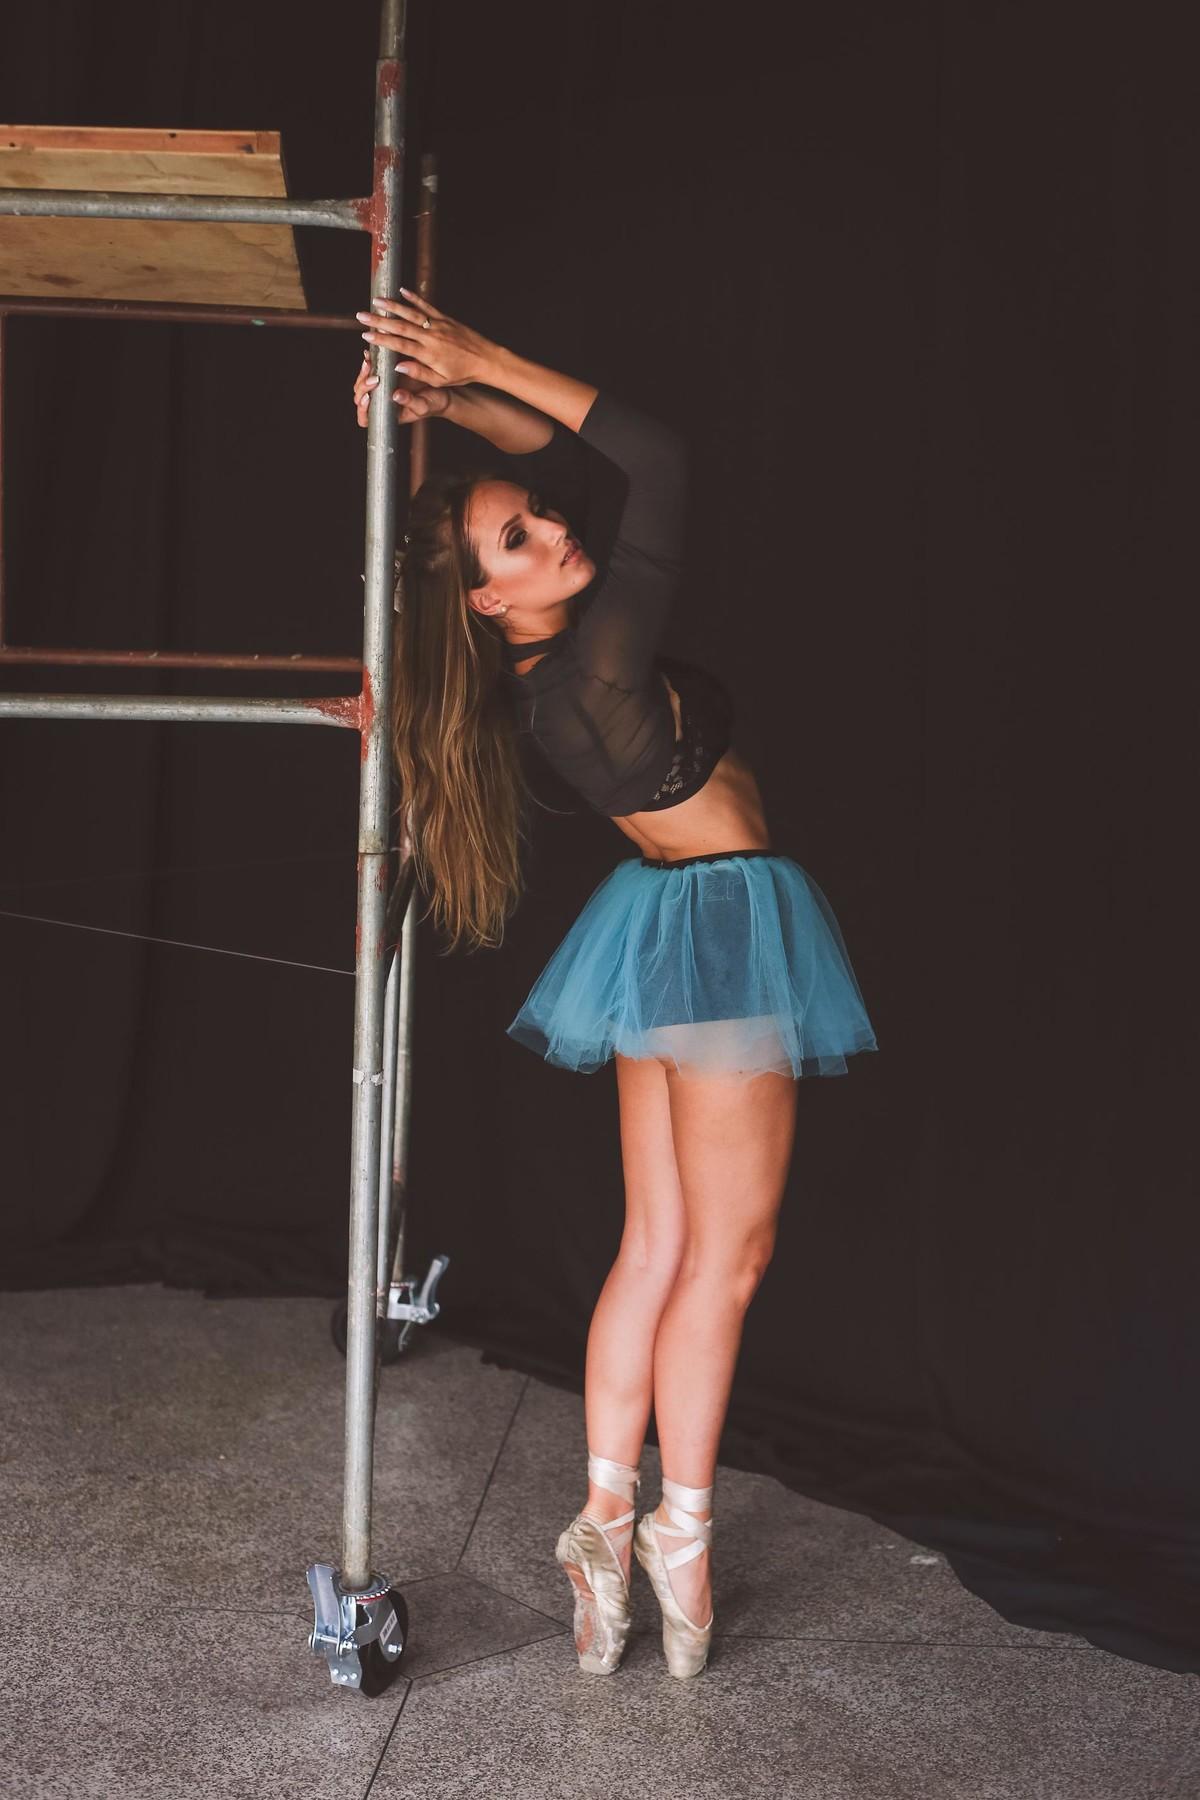 Moda vitoria editoral fashion capixaba fotos ensaio cute feminina beauty girls make-up hair ensaio feminino fotos body cabelo boho inspiração bailarina ballet dancer leonarga zago